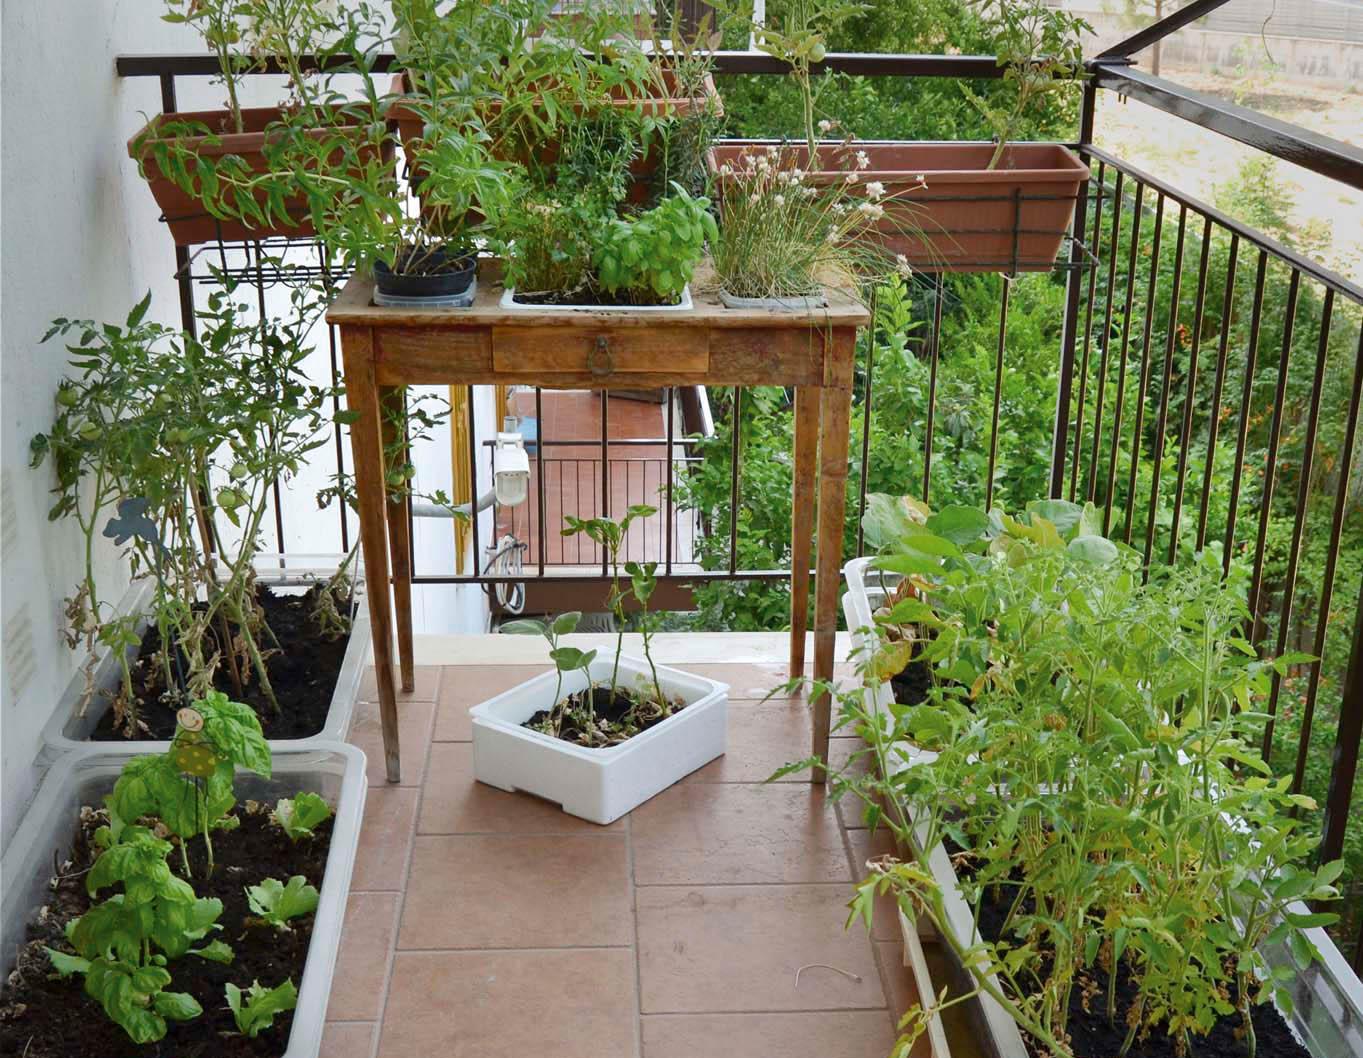 Orto sul balcone, I\'m obsessed!   fourfancy Magazine